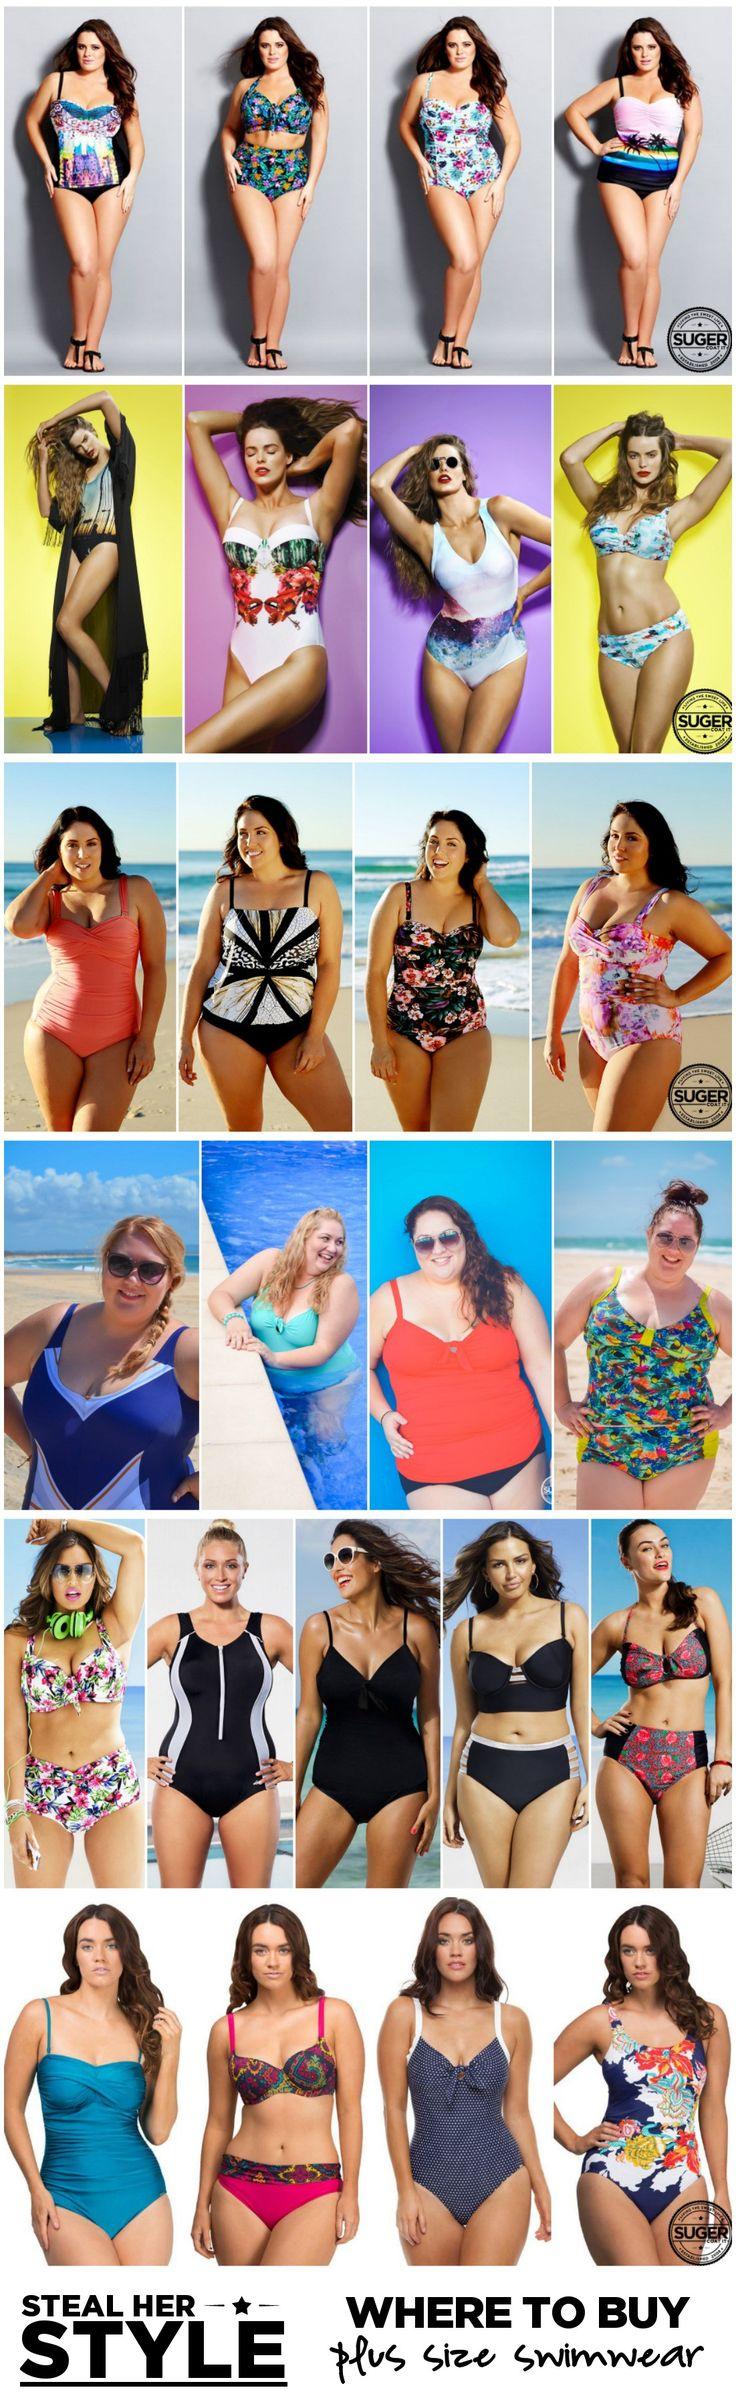 Where to Buy Plus Size Swimwear Summer 2014/2015 | Suger Coat It: An Australian Plus Size Fashion & Lifestyle Blog